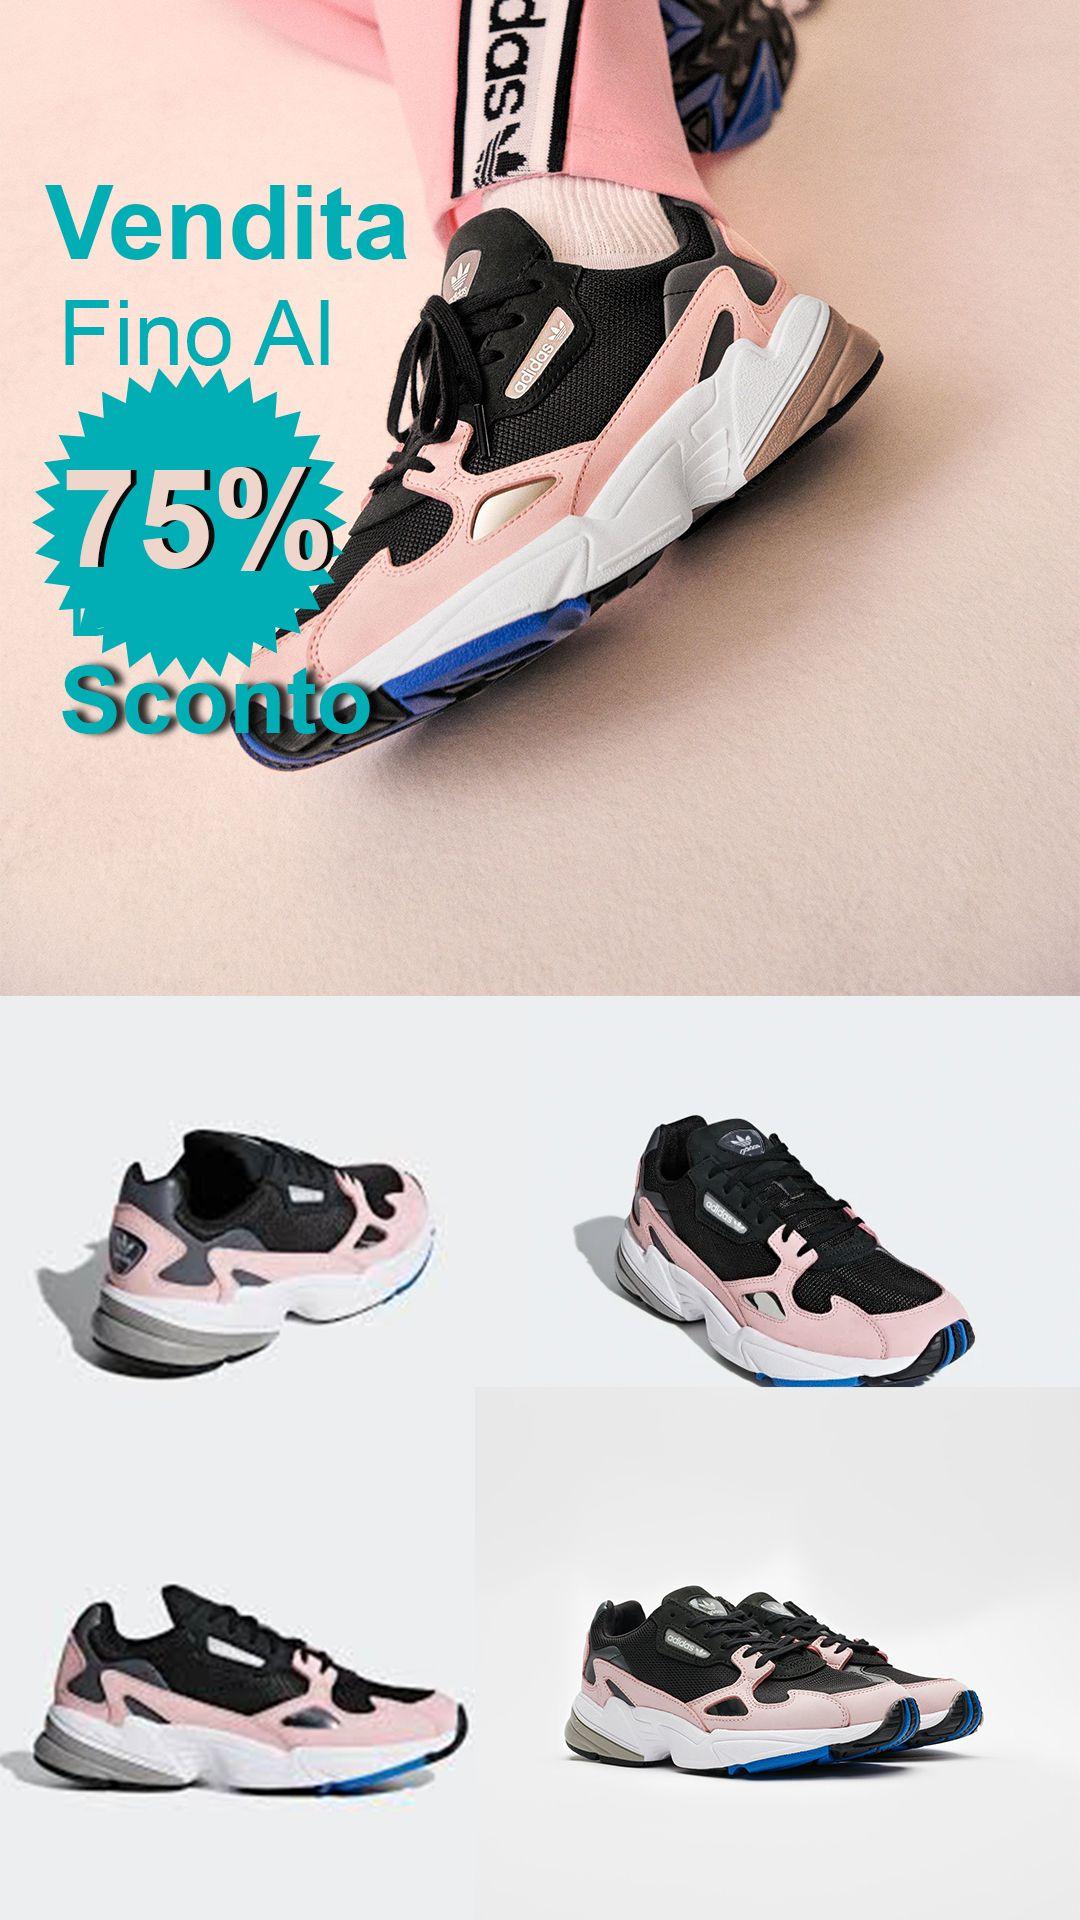 sconti scarpe adidas donna